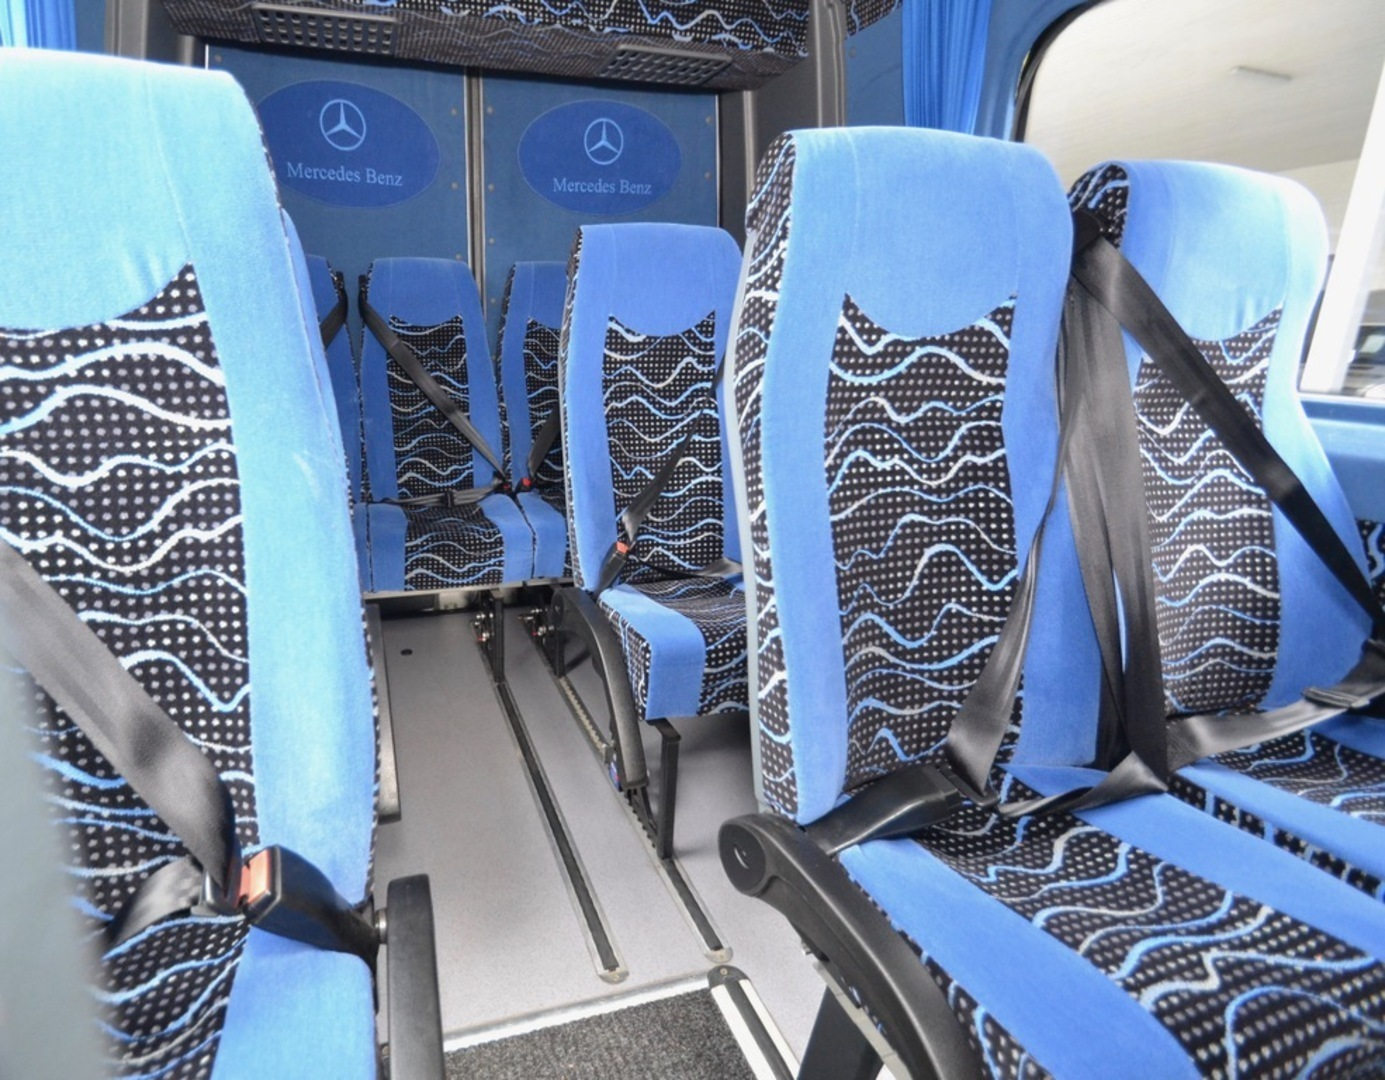 Mercedes-Benz-Automet Sprinter, 516 CDI Automet Jumbo 23 paikkaa